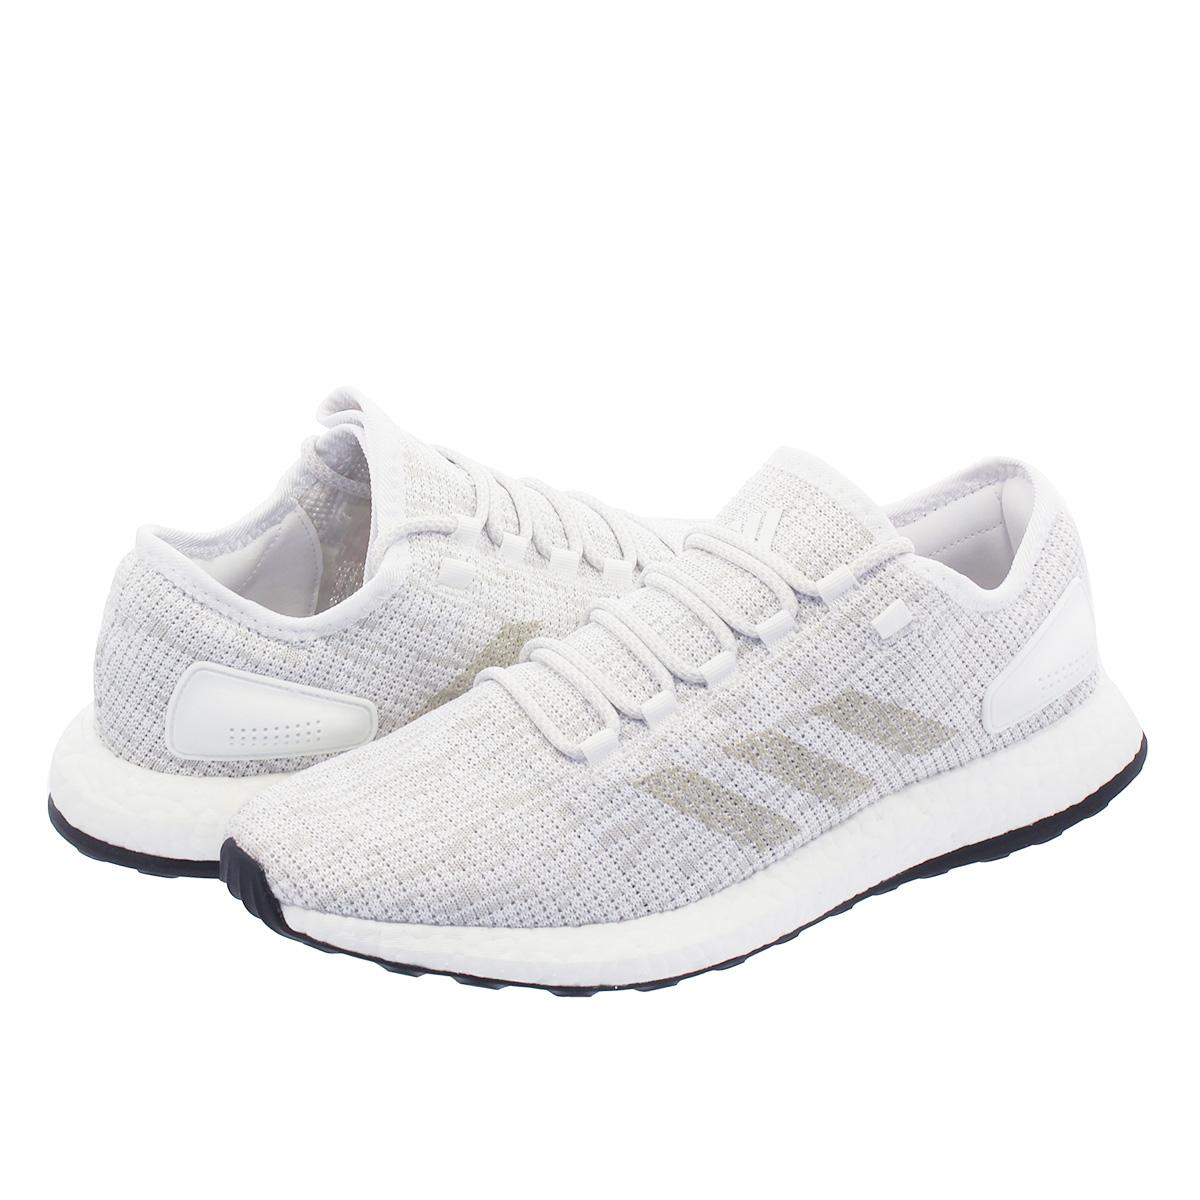 the latest e1edd 2b098 adidas PureBOOST Adidas pure boost RUNNING WHITEGREY ONECRYSTAL WHITE  bb6277